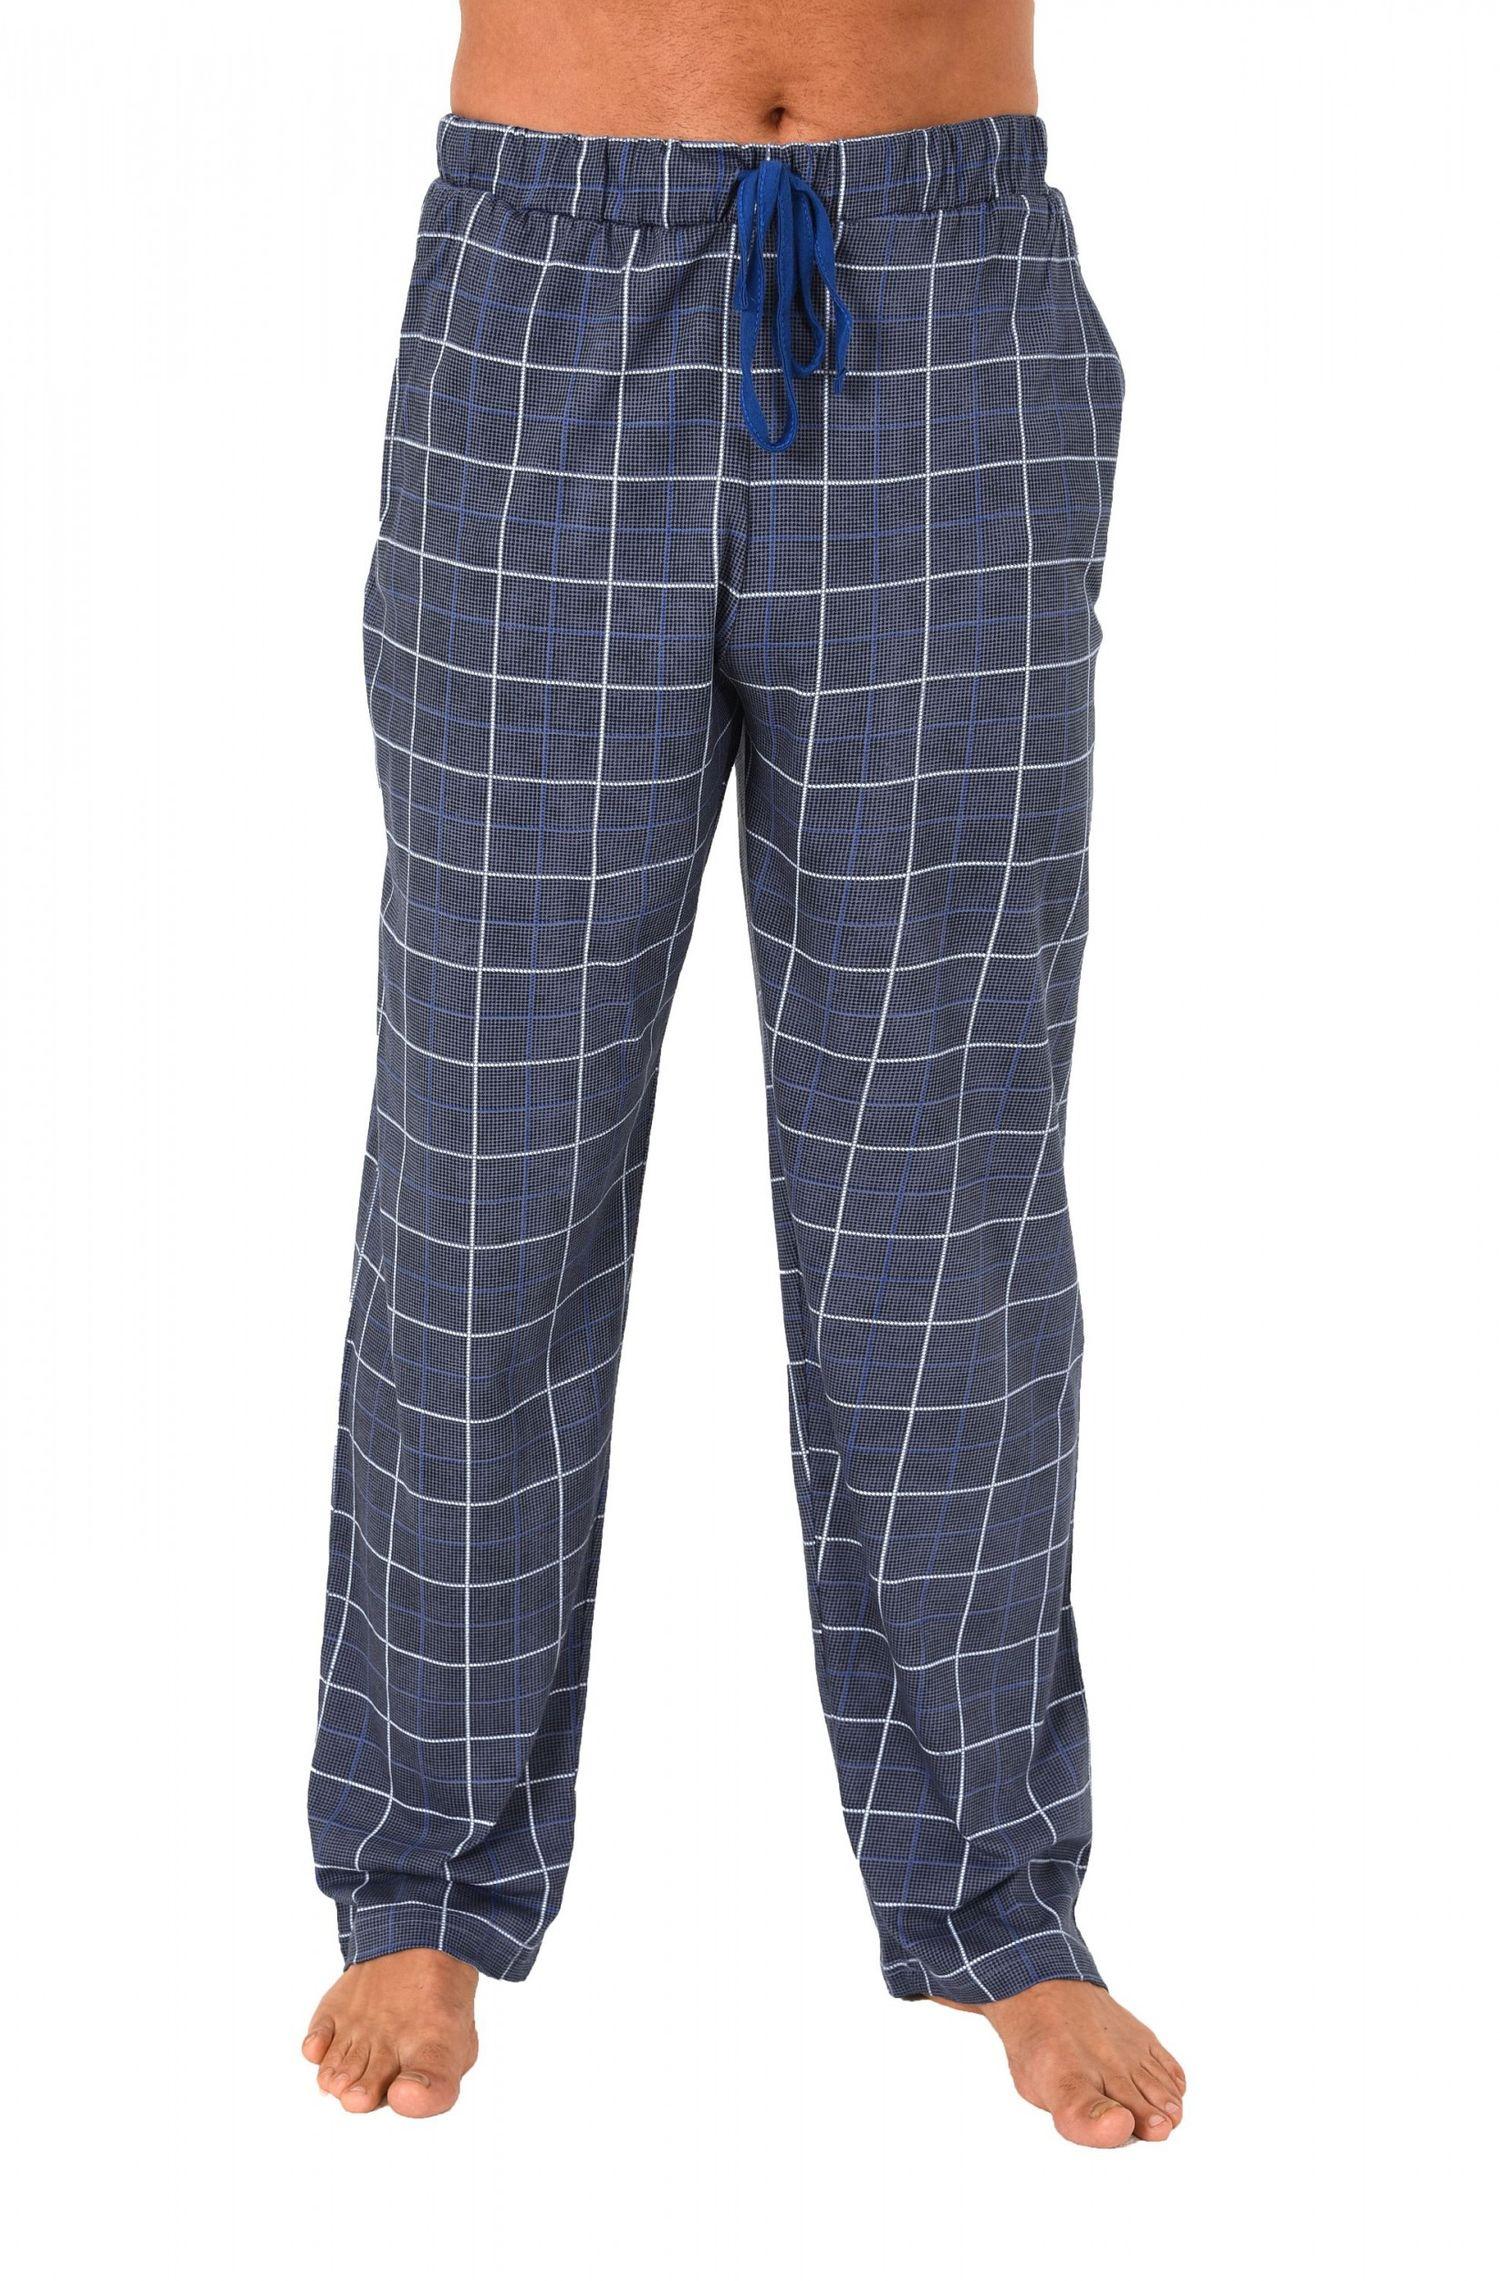 Herren Pyjama Hose lang – Mix & Match – Karo Optik – 122 90 524 – Bild 3